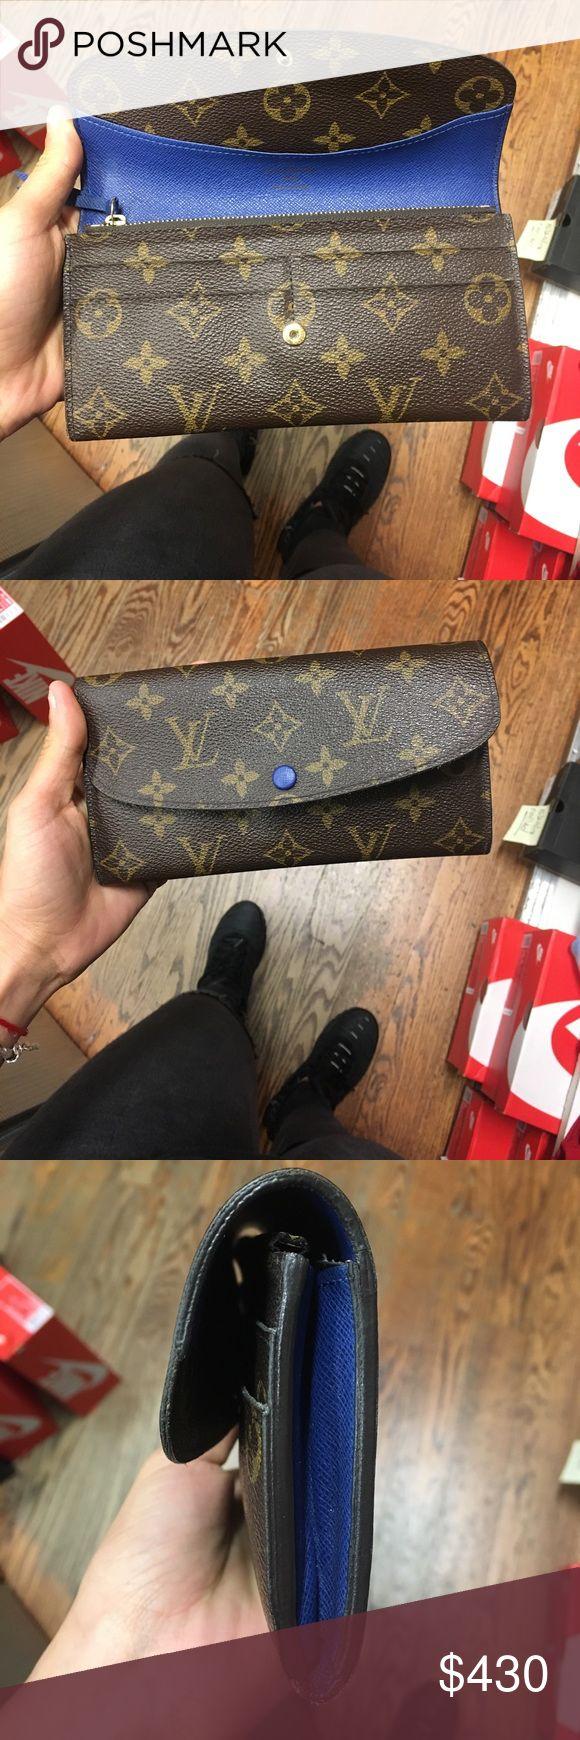 "Original Louis Vuitton Wallet ""Emilie"" Original Monogram Logo 4 credit card slots, 1 interior compartment for bills, 2 interior compartments for id Bags Wallets"